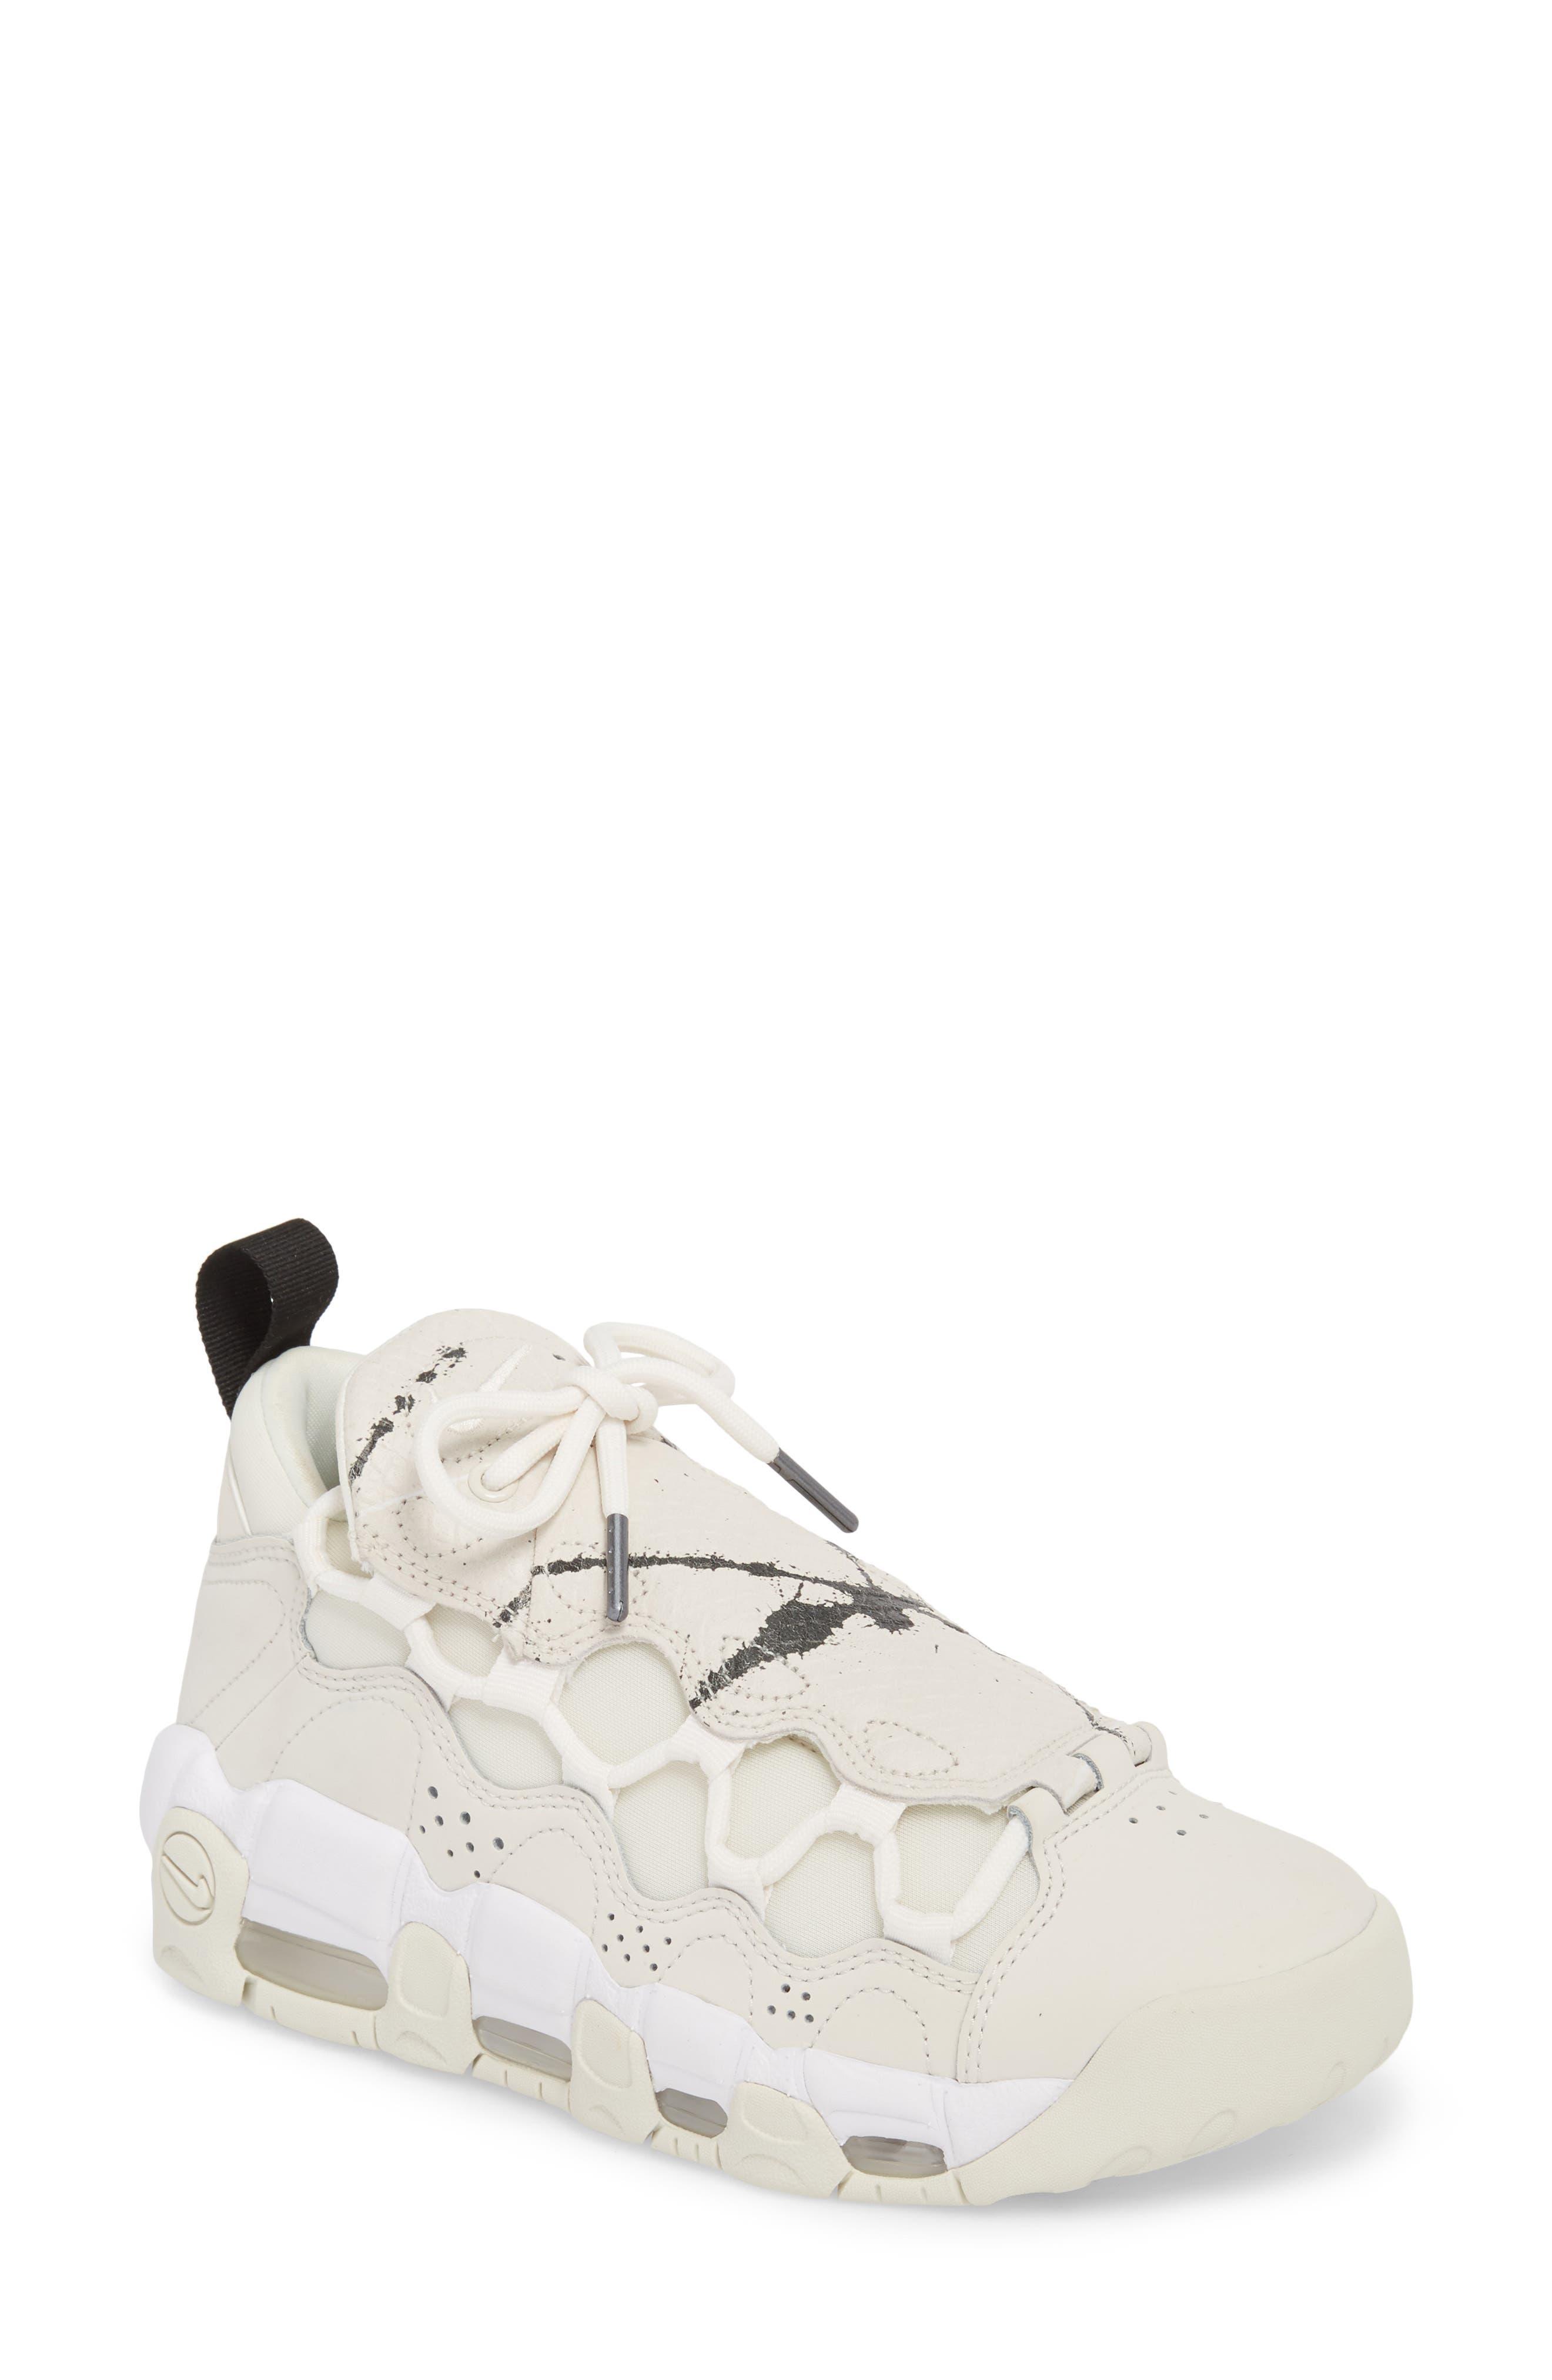 Nike Air More Money Sneaker (Women)